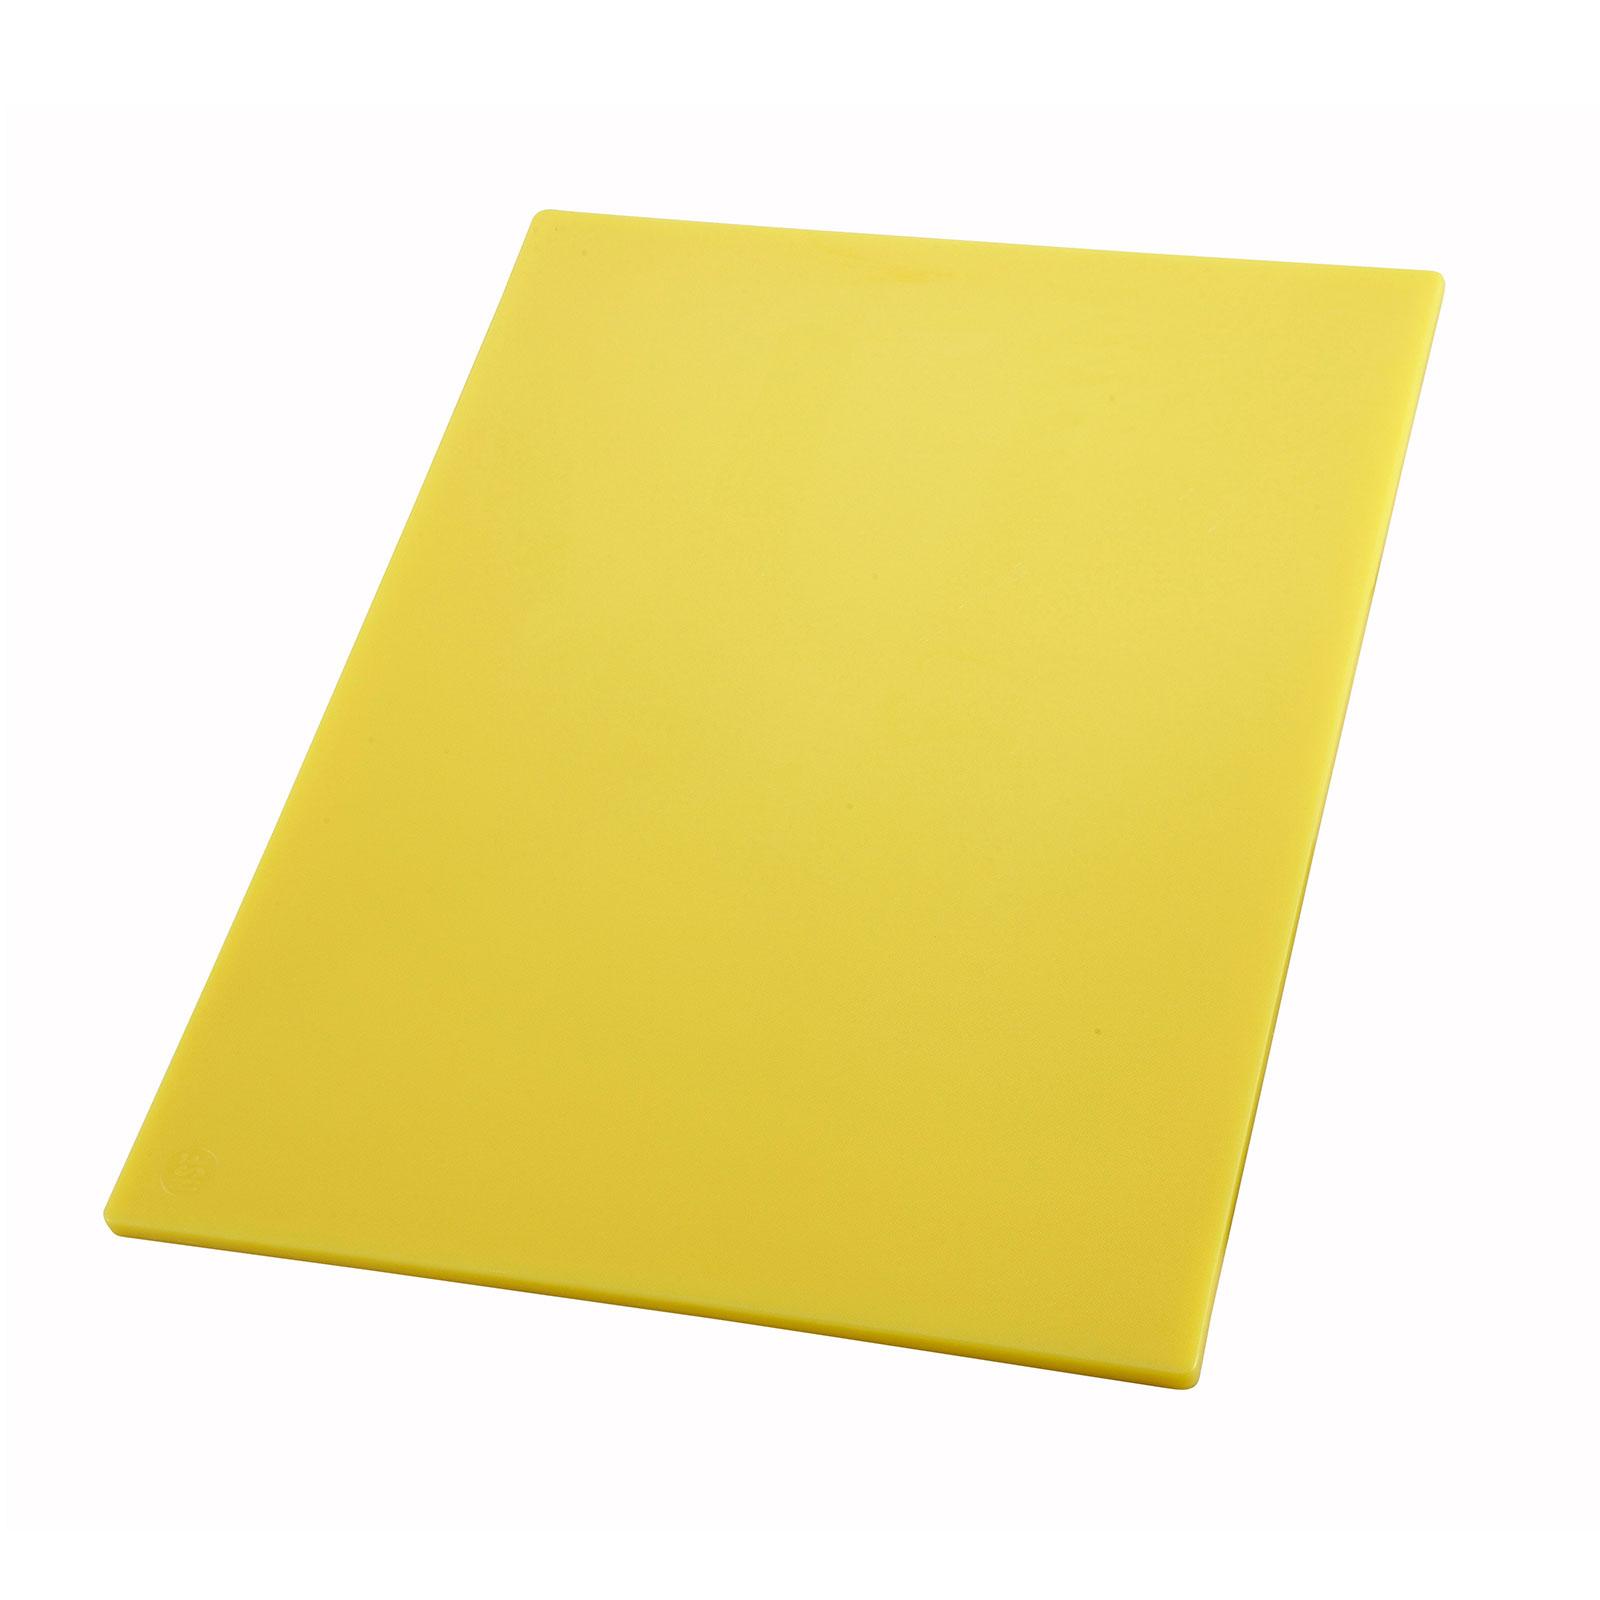 Winco CBYL-1520 cutting board, plastic